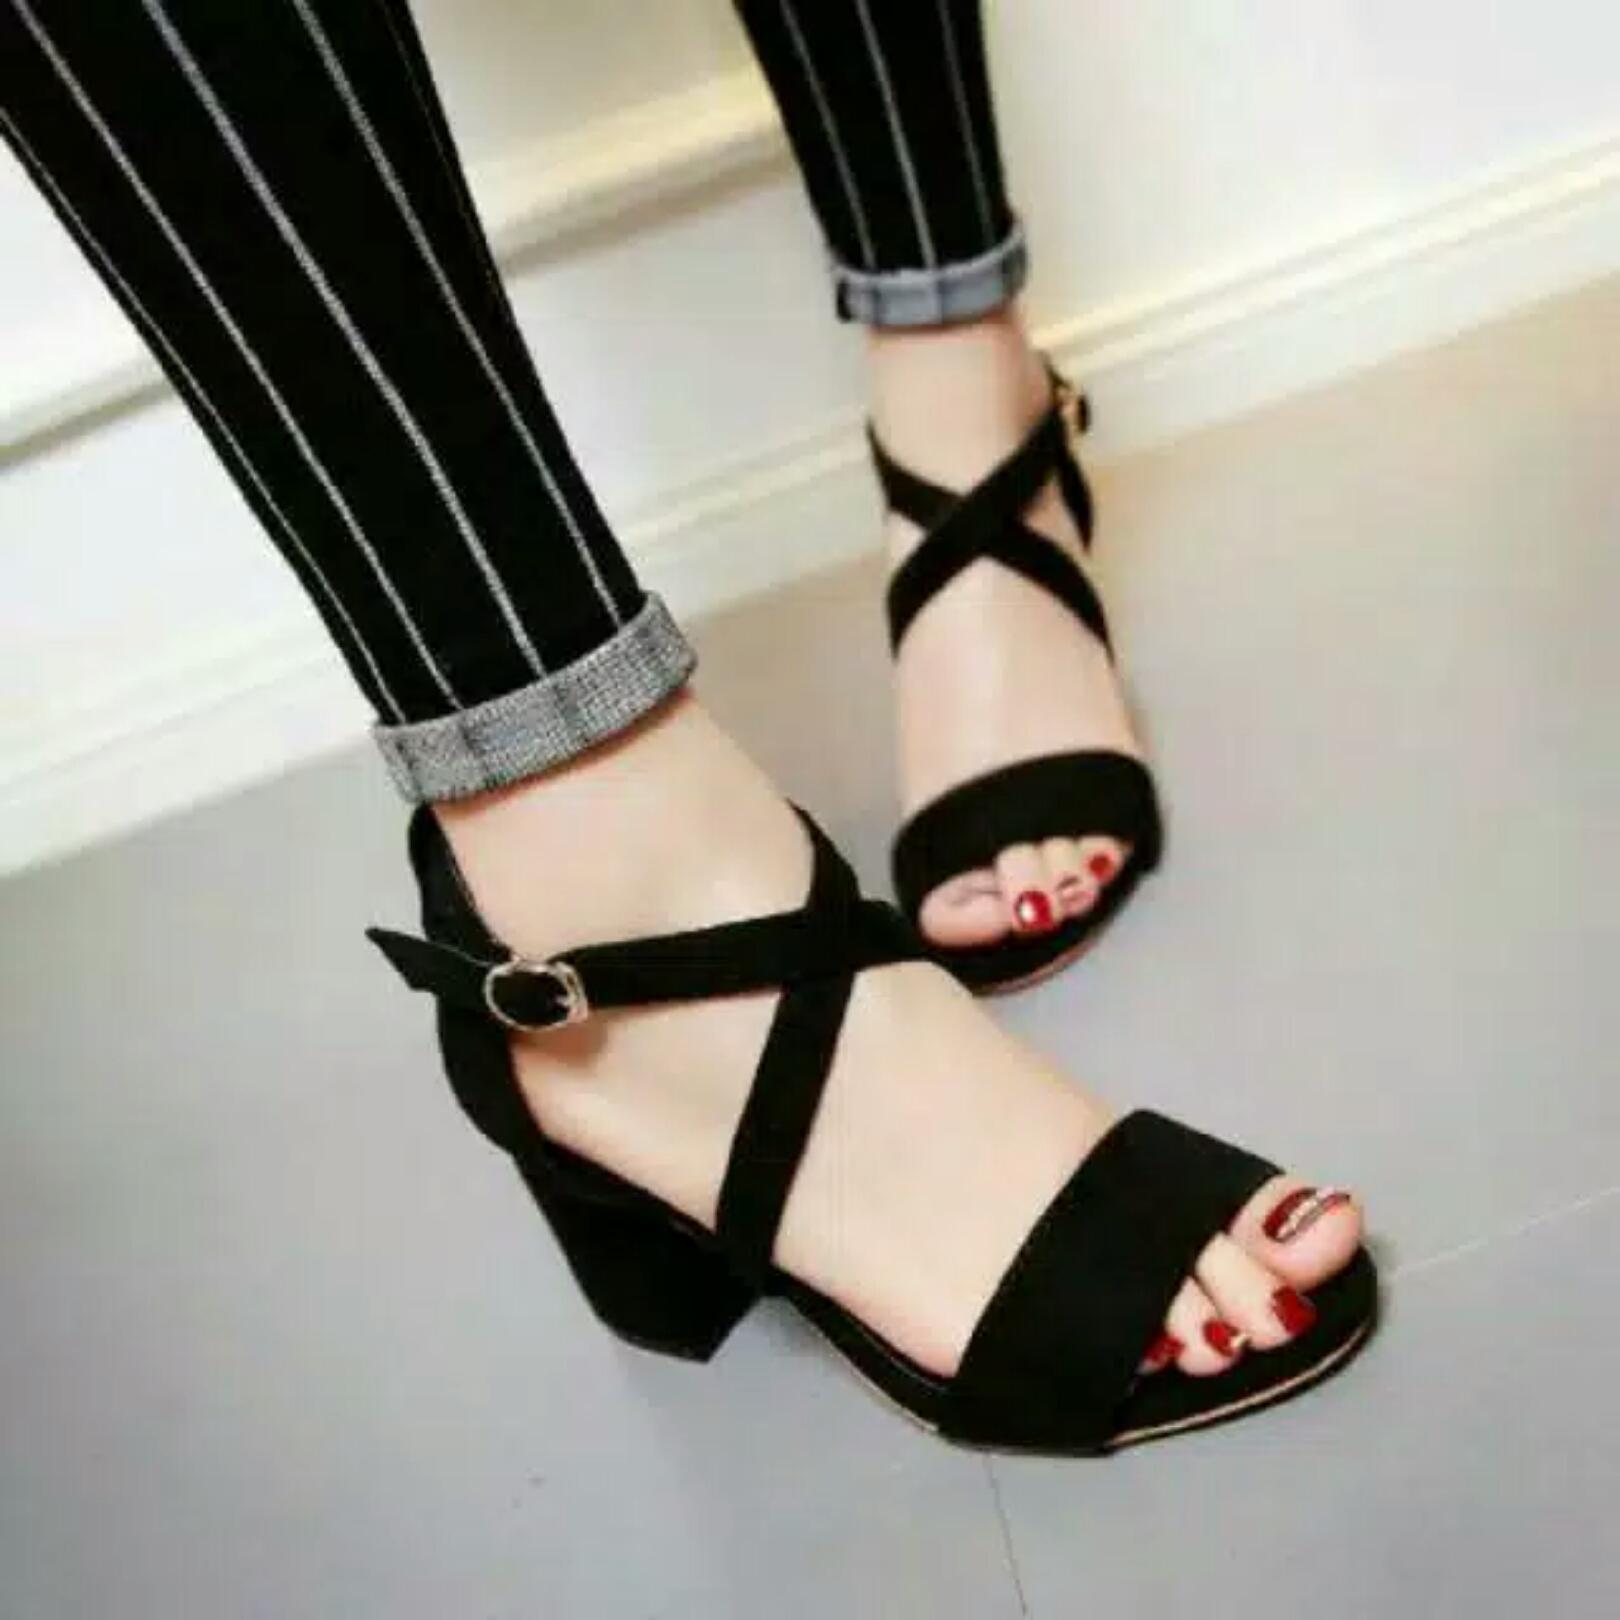 Dshoppers Shoes - Aliva Cross Strap Heel